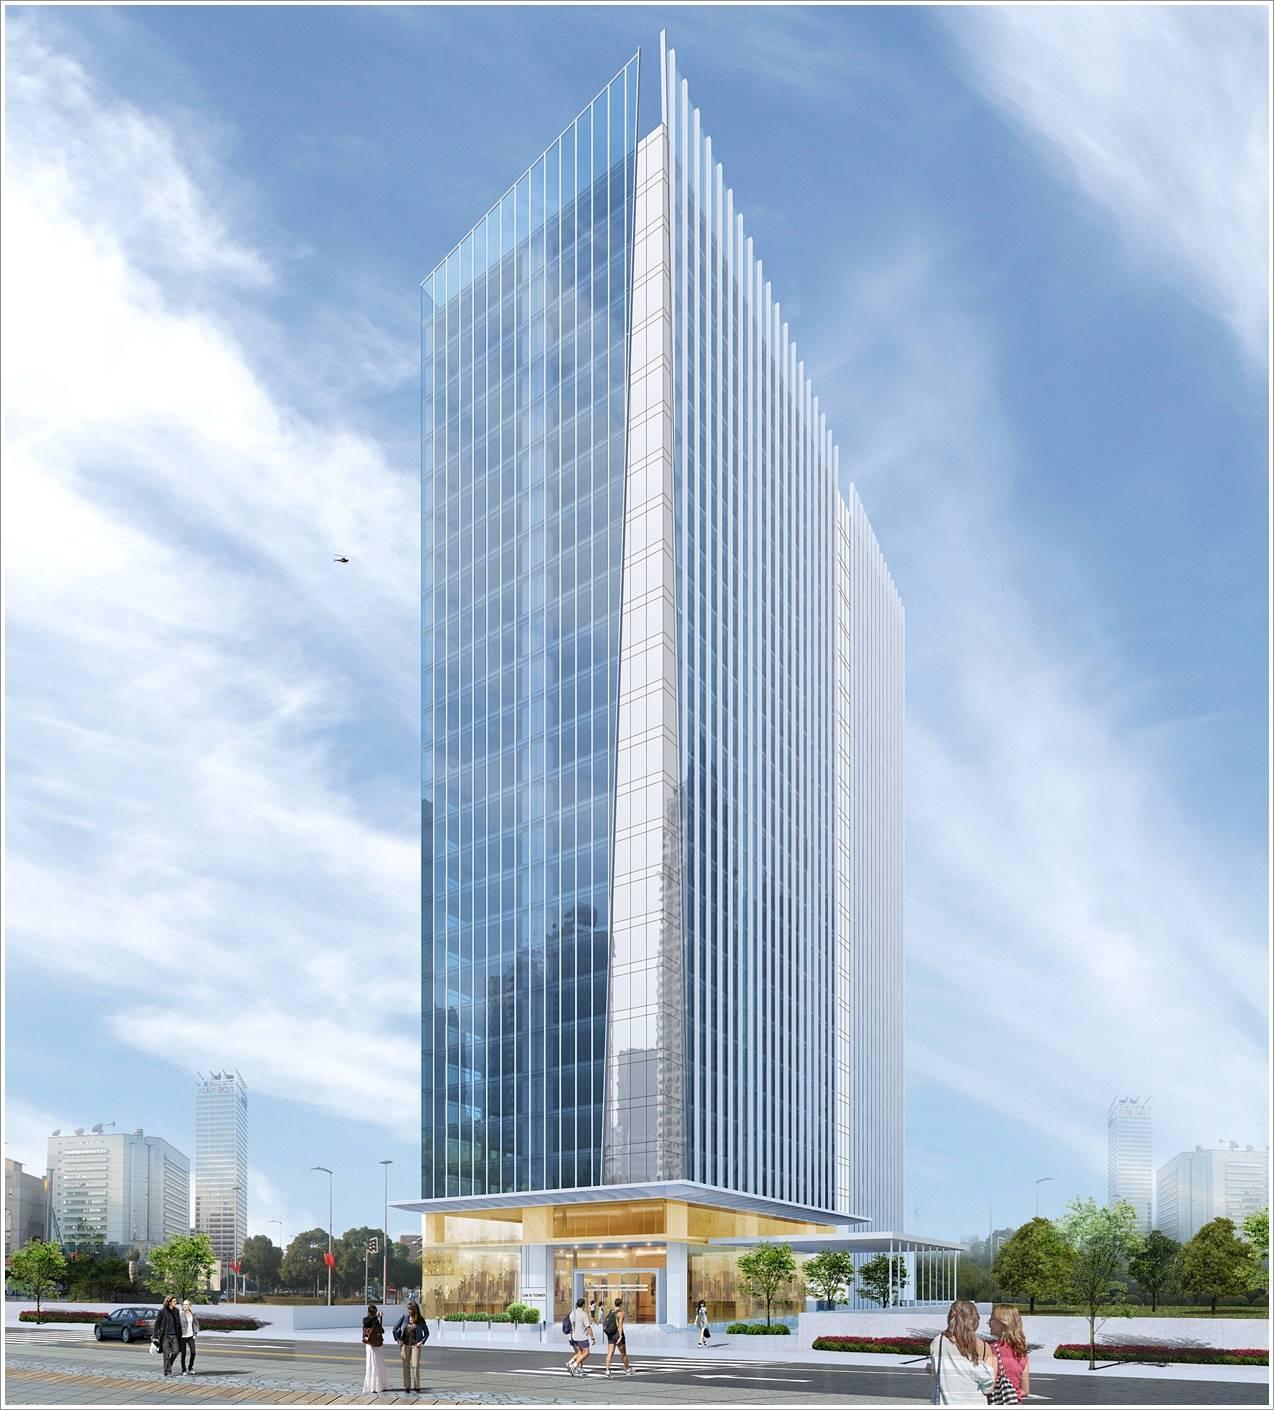 lim-tower-3-nguyen-dinh-chieu-quan-1-van-phong-cho-thue-tphcm-5real.vn-01